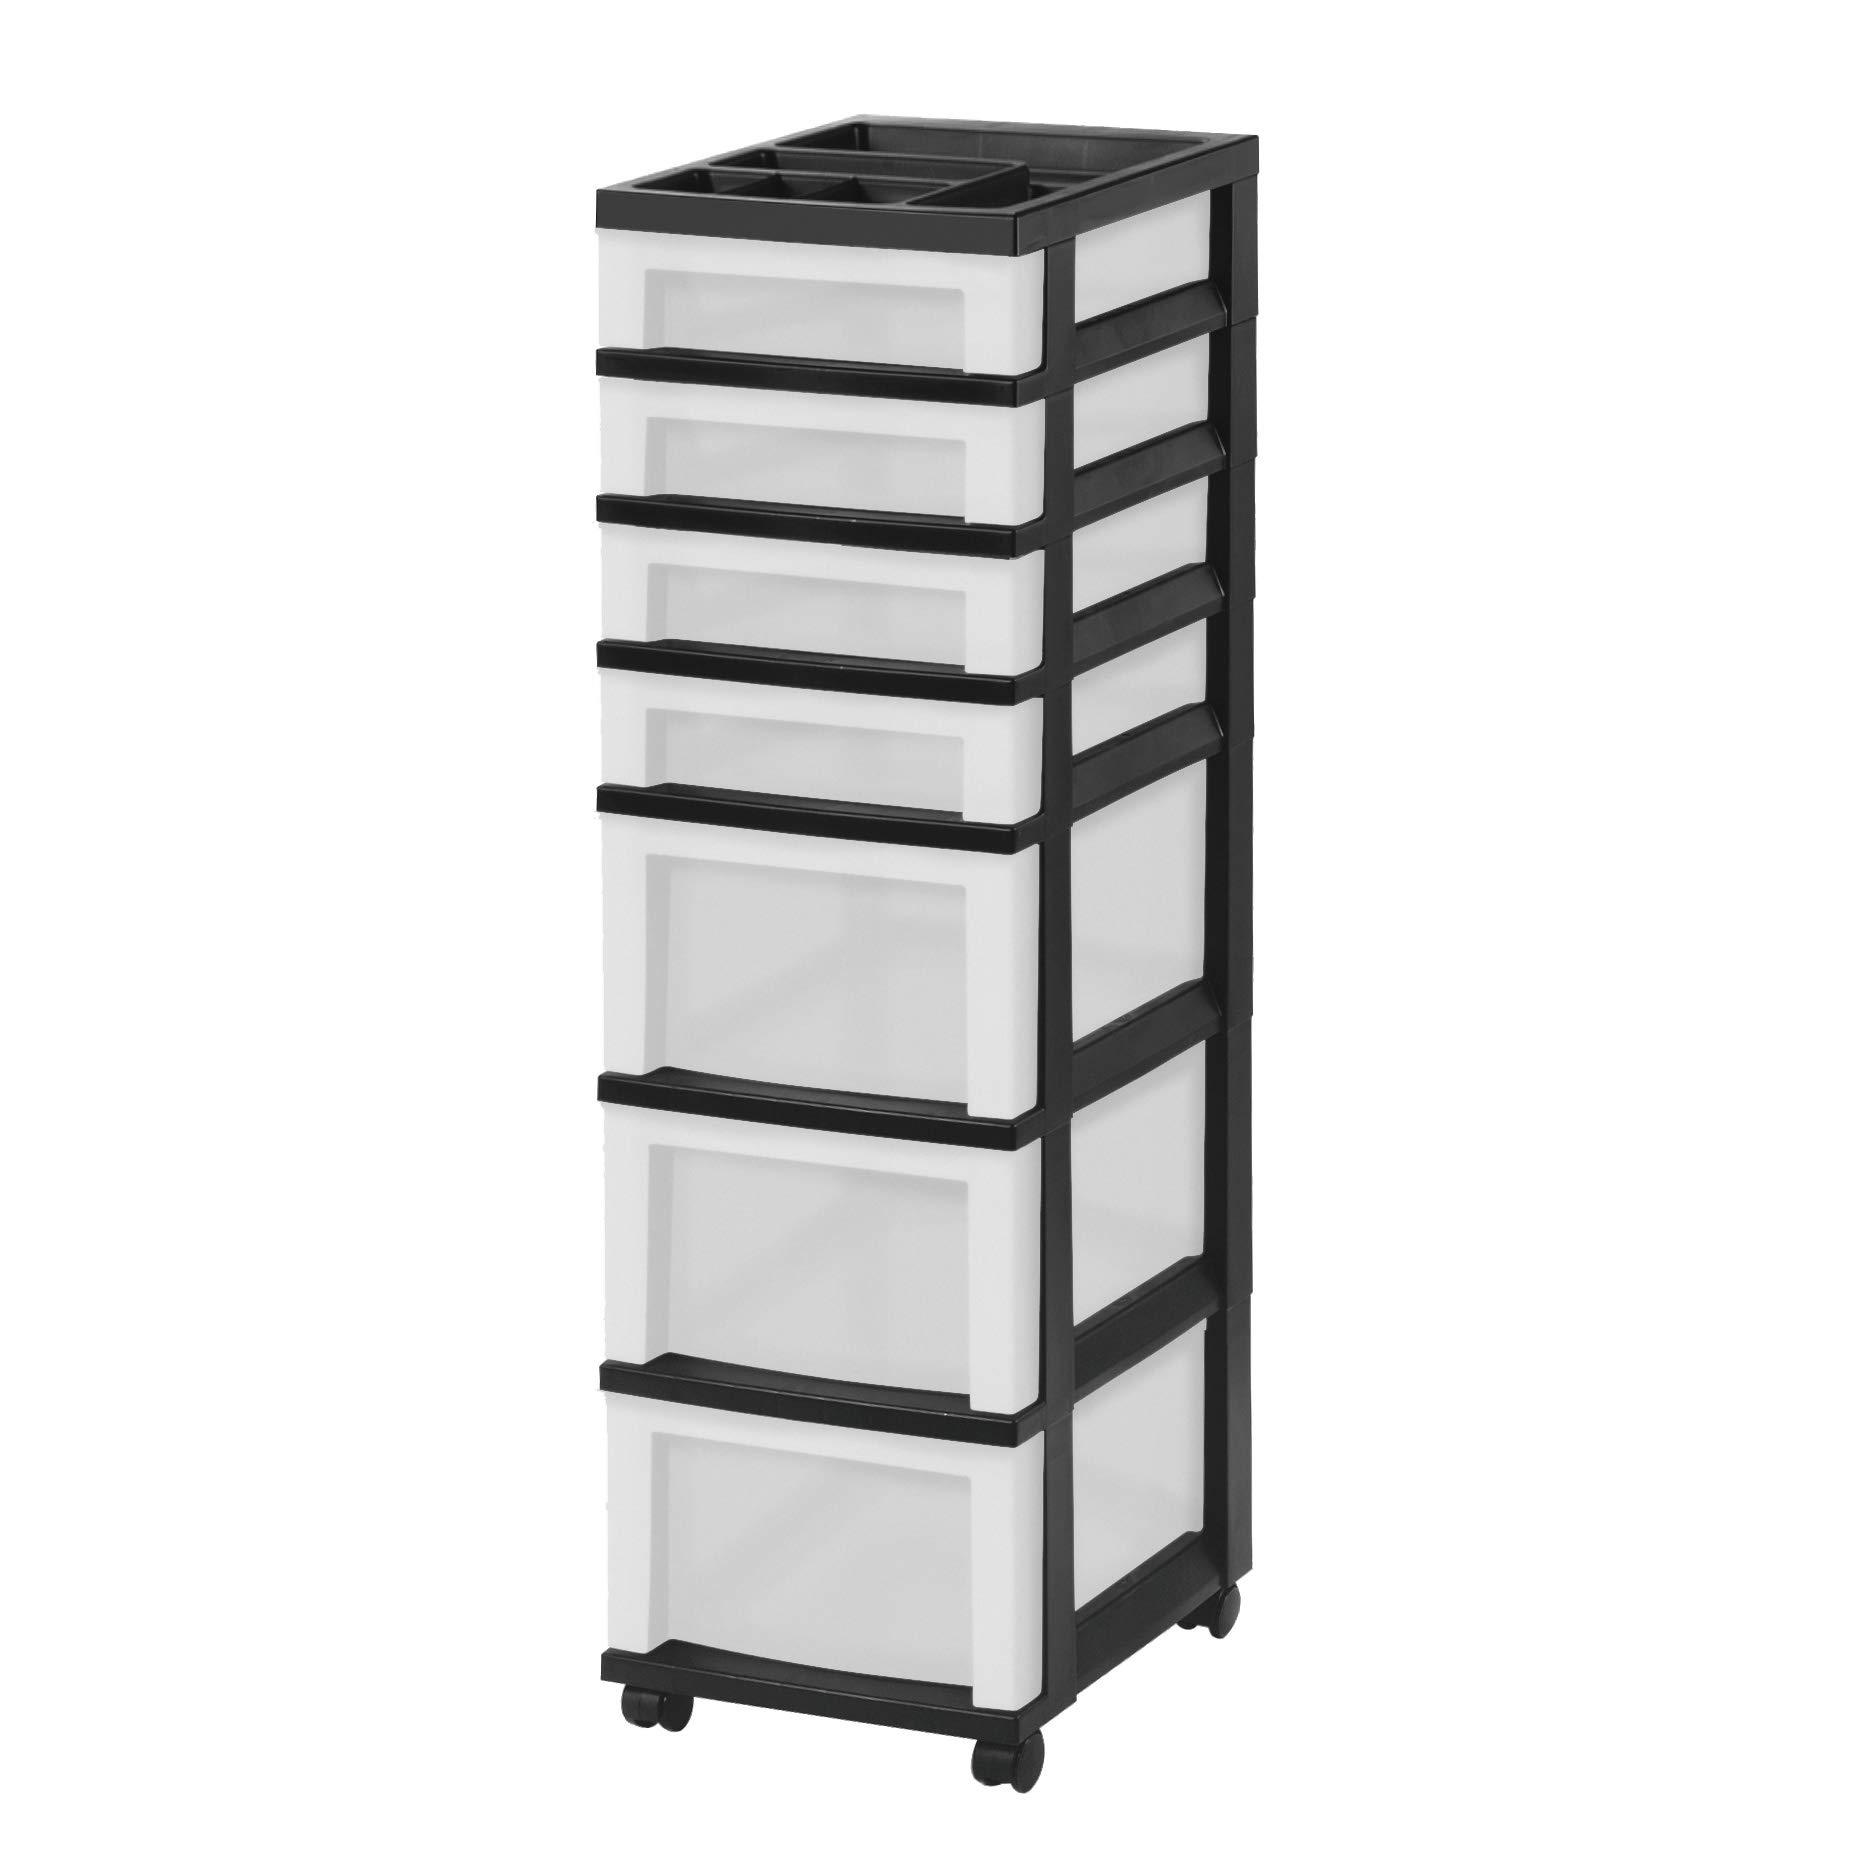 IRIS USA, Inc. MC-343-TOP Medium 7-Drawer Storage Rolling Cart with Organizer Top, Black/Pearl